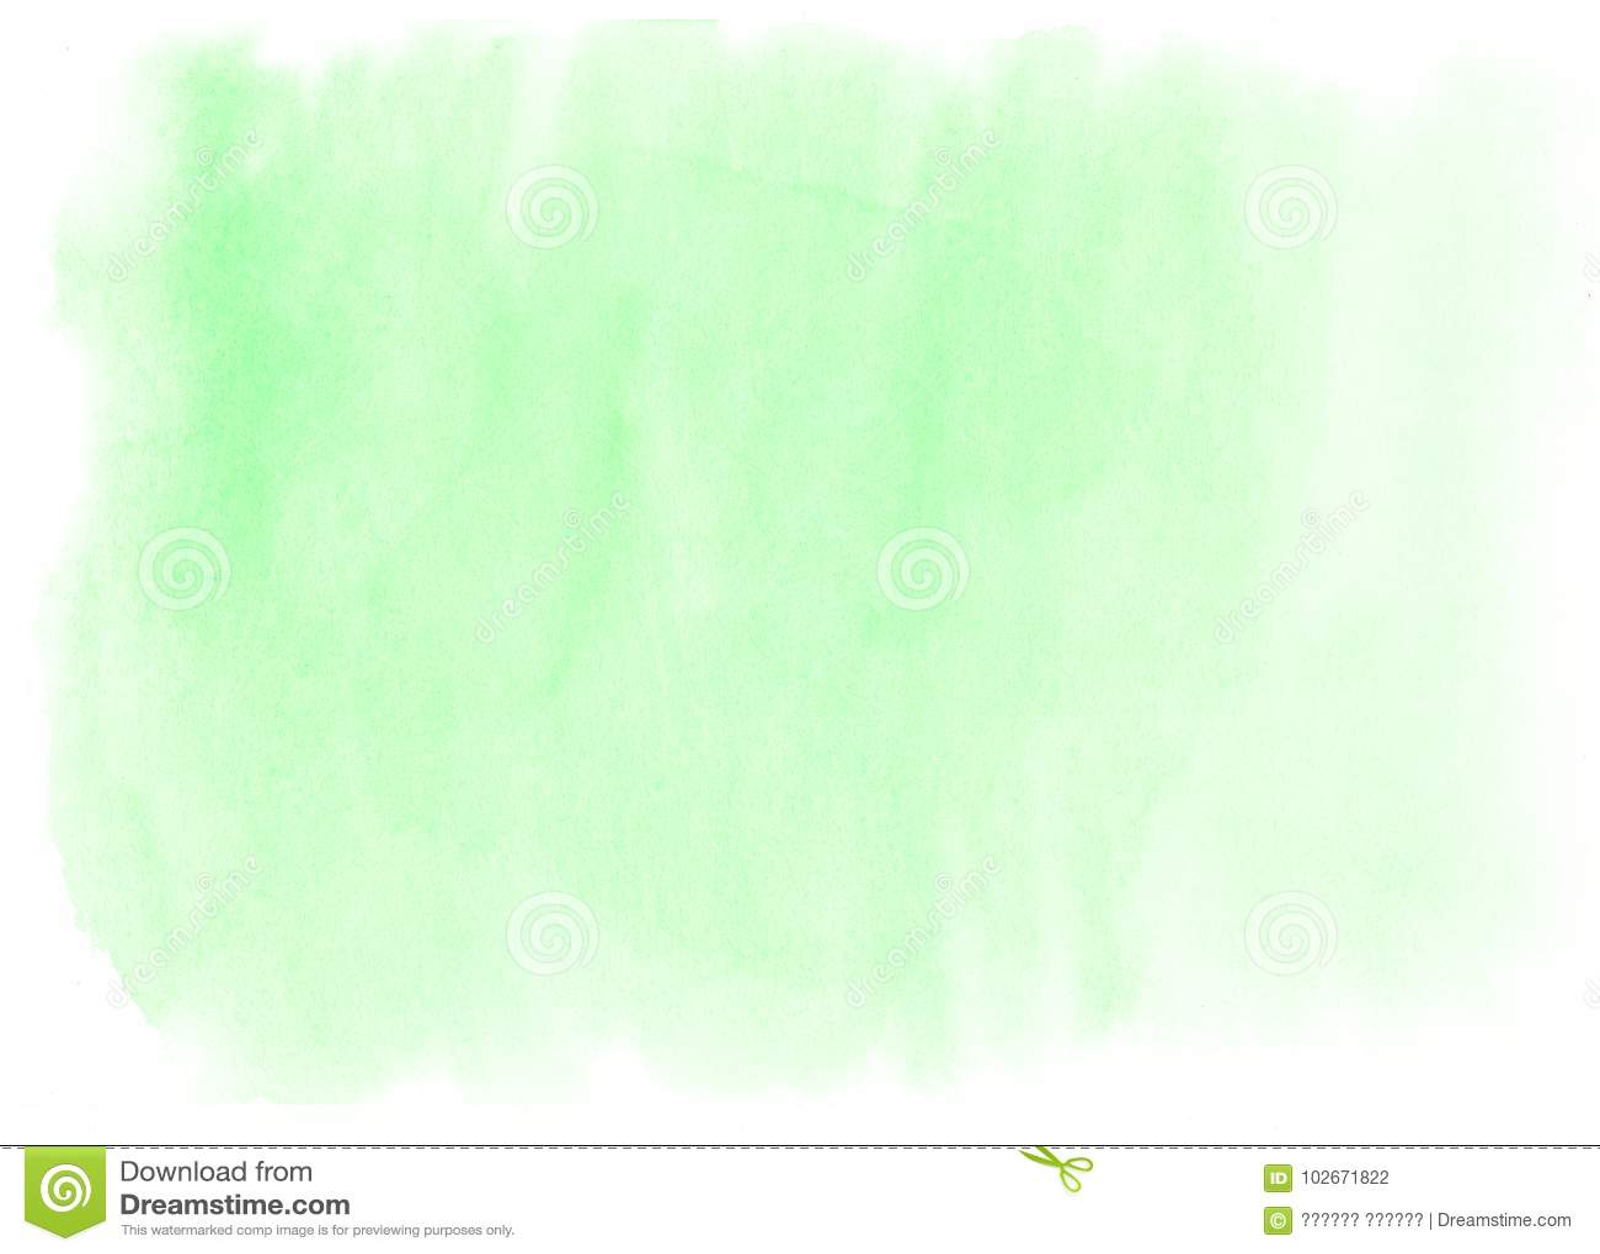 Abstracte groene waterverfachtergrond in hoge resolutie